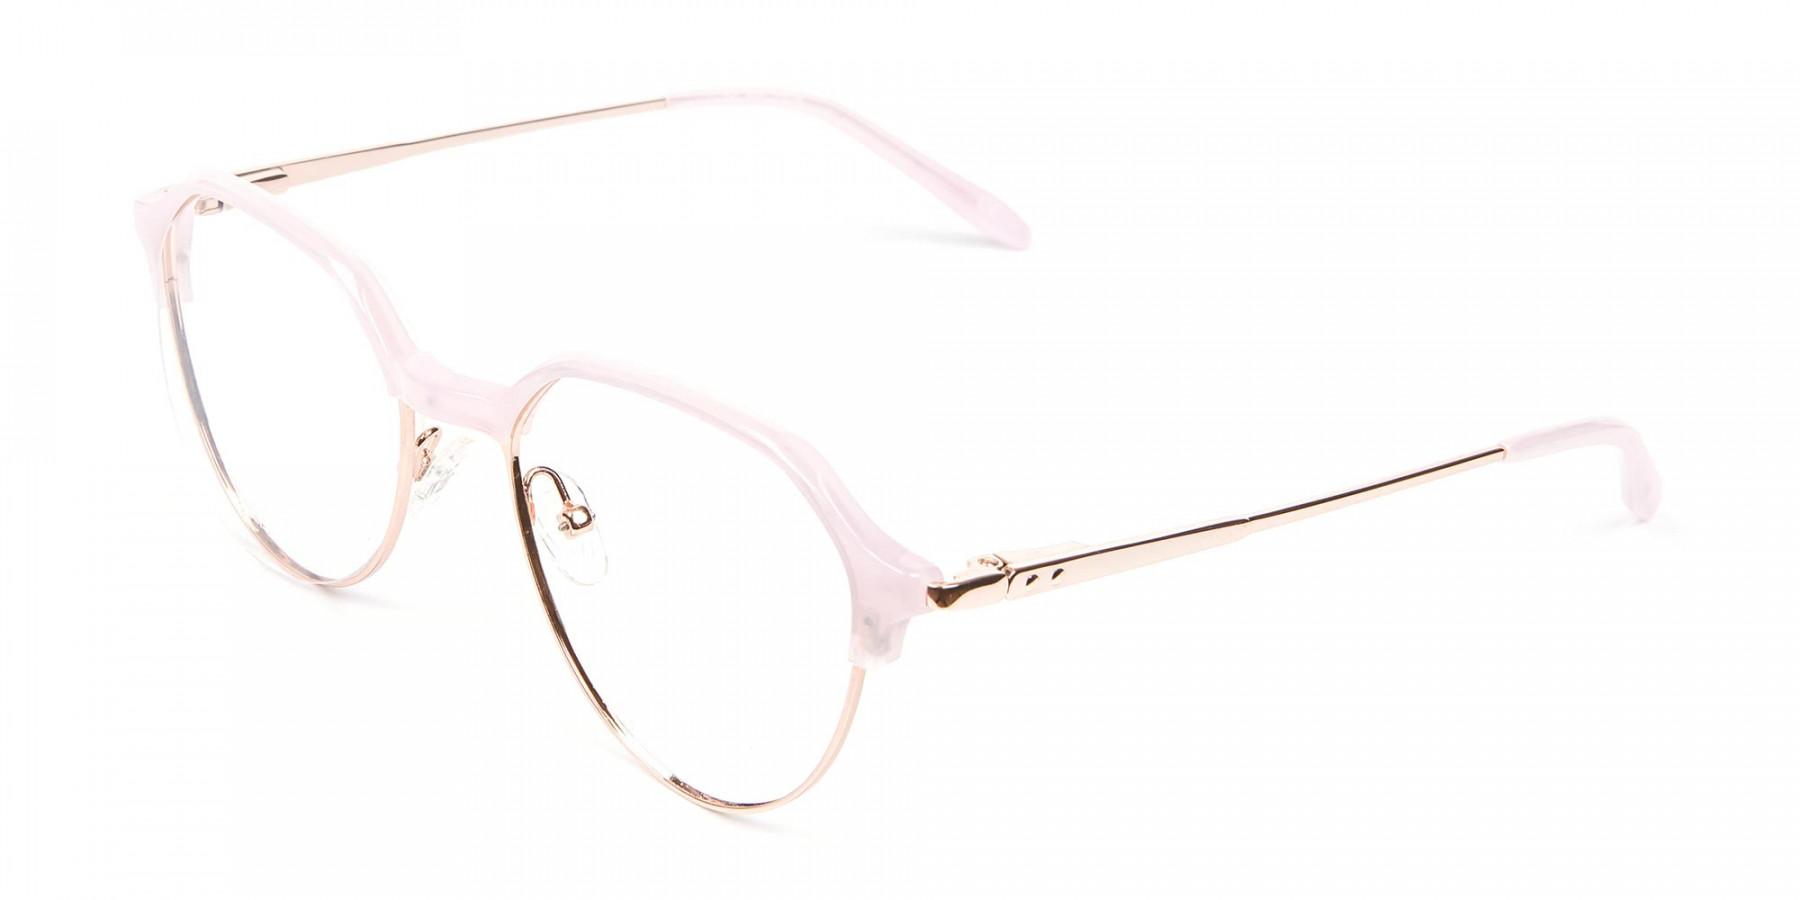 Fantasy Rosy Octagonal Glasses - 1